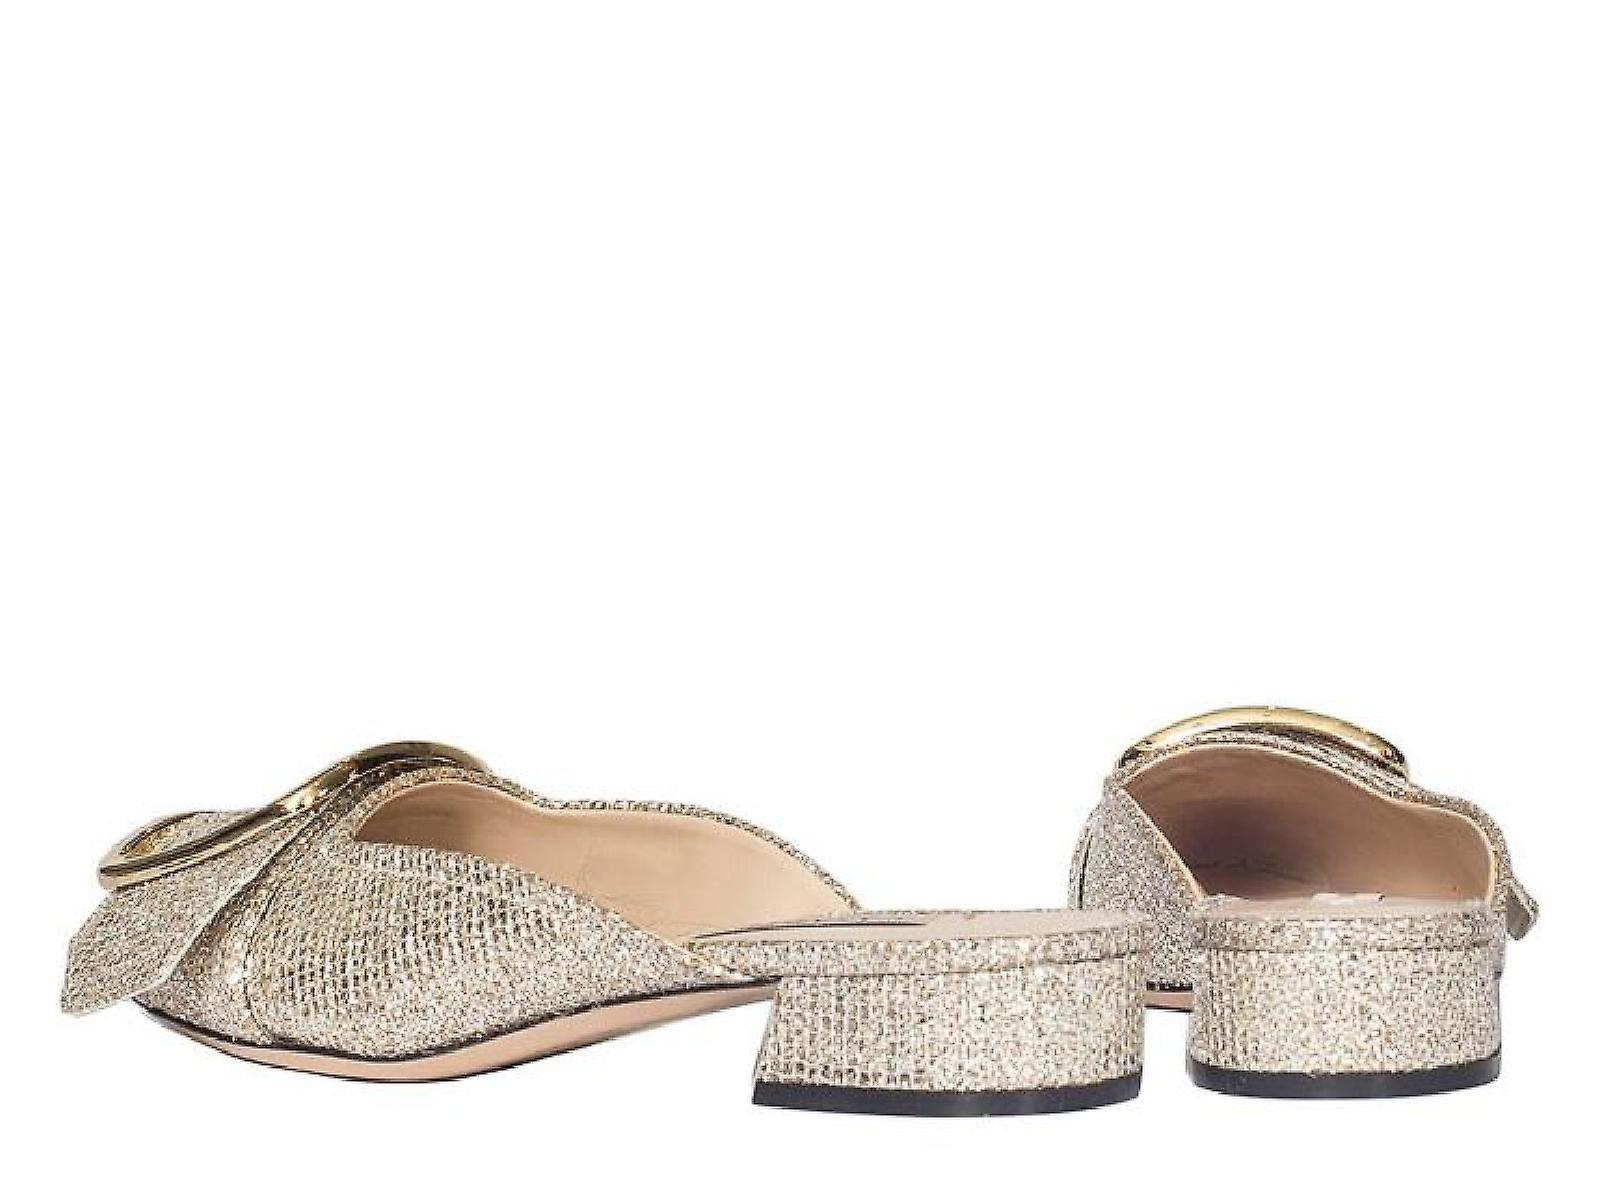 Casadei close slippers in platinum leather glitter